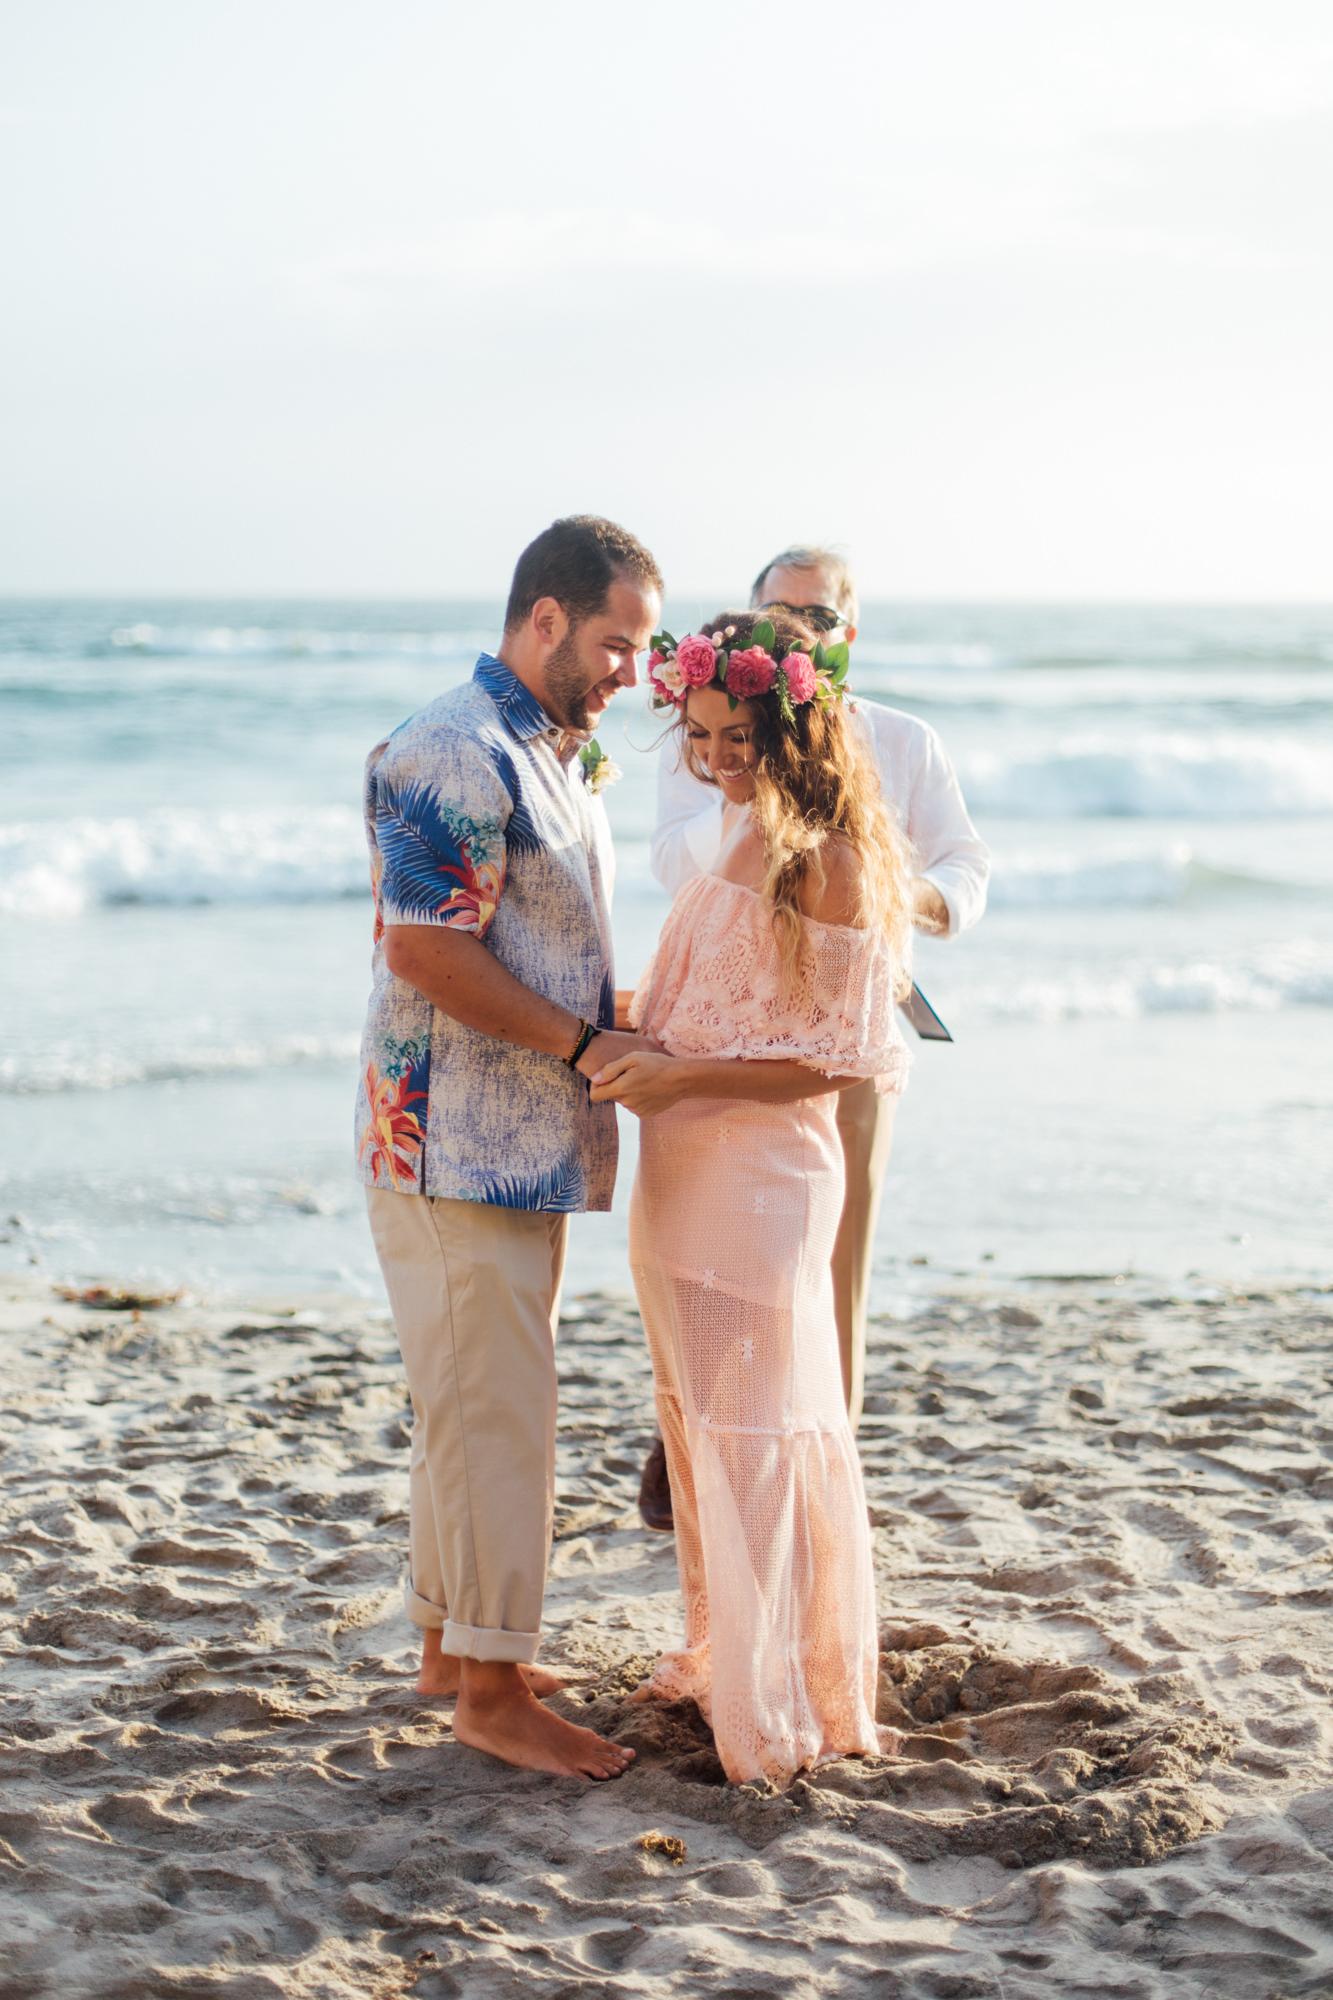 San Diego Wedding photography at Cardiff Beach028.jpg